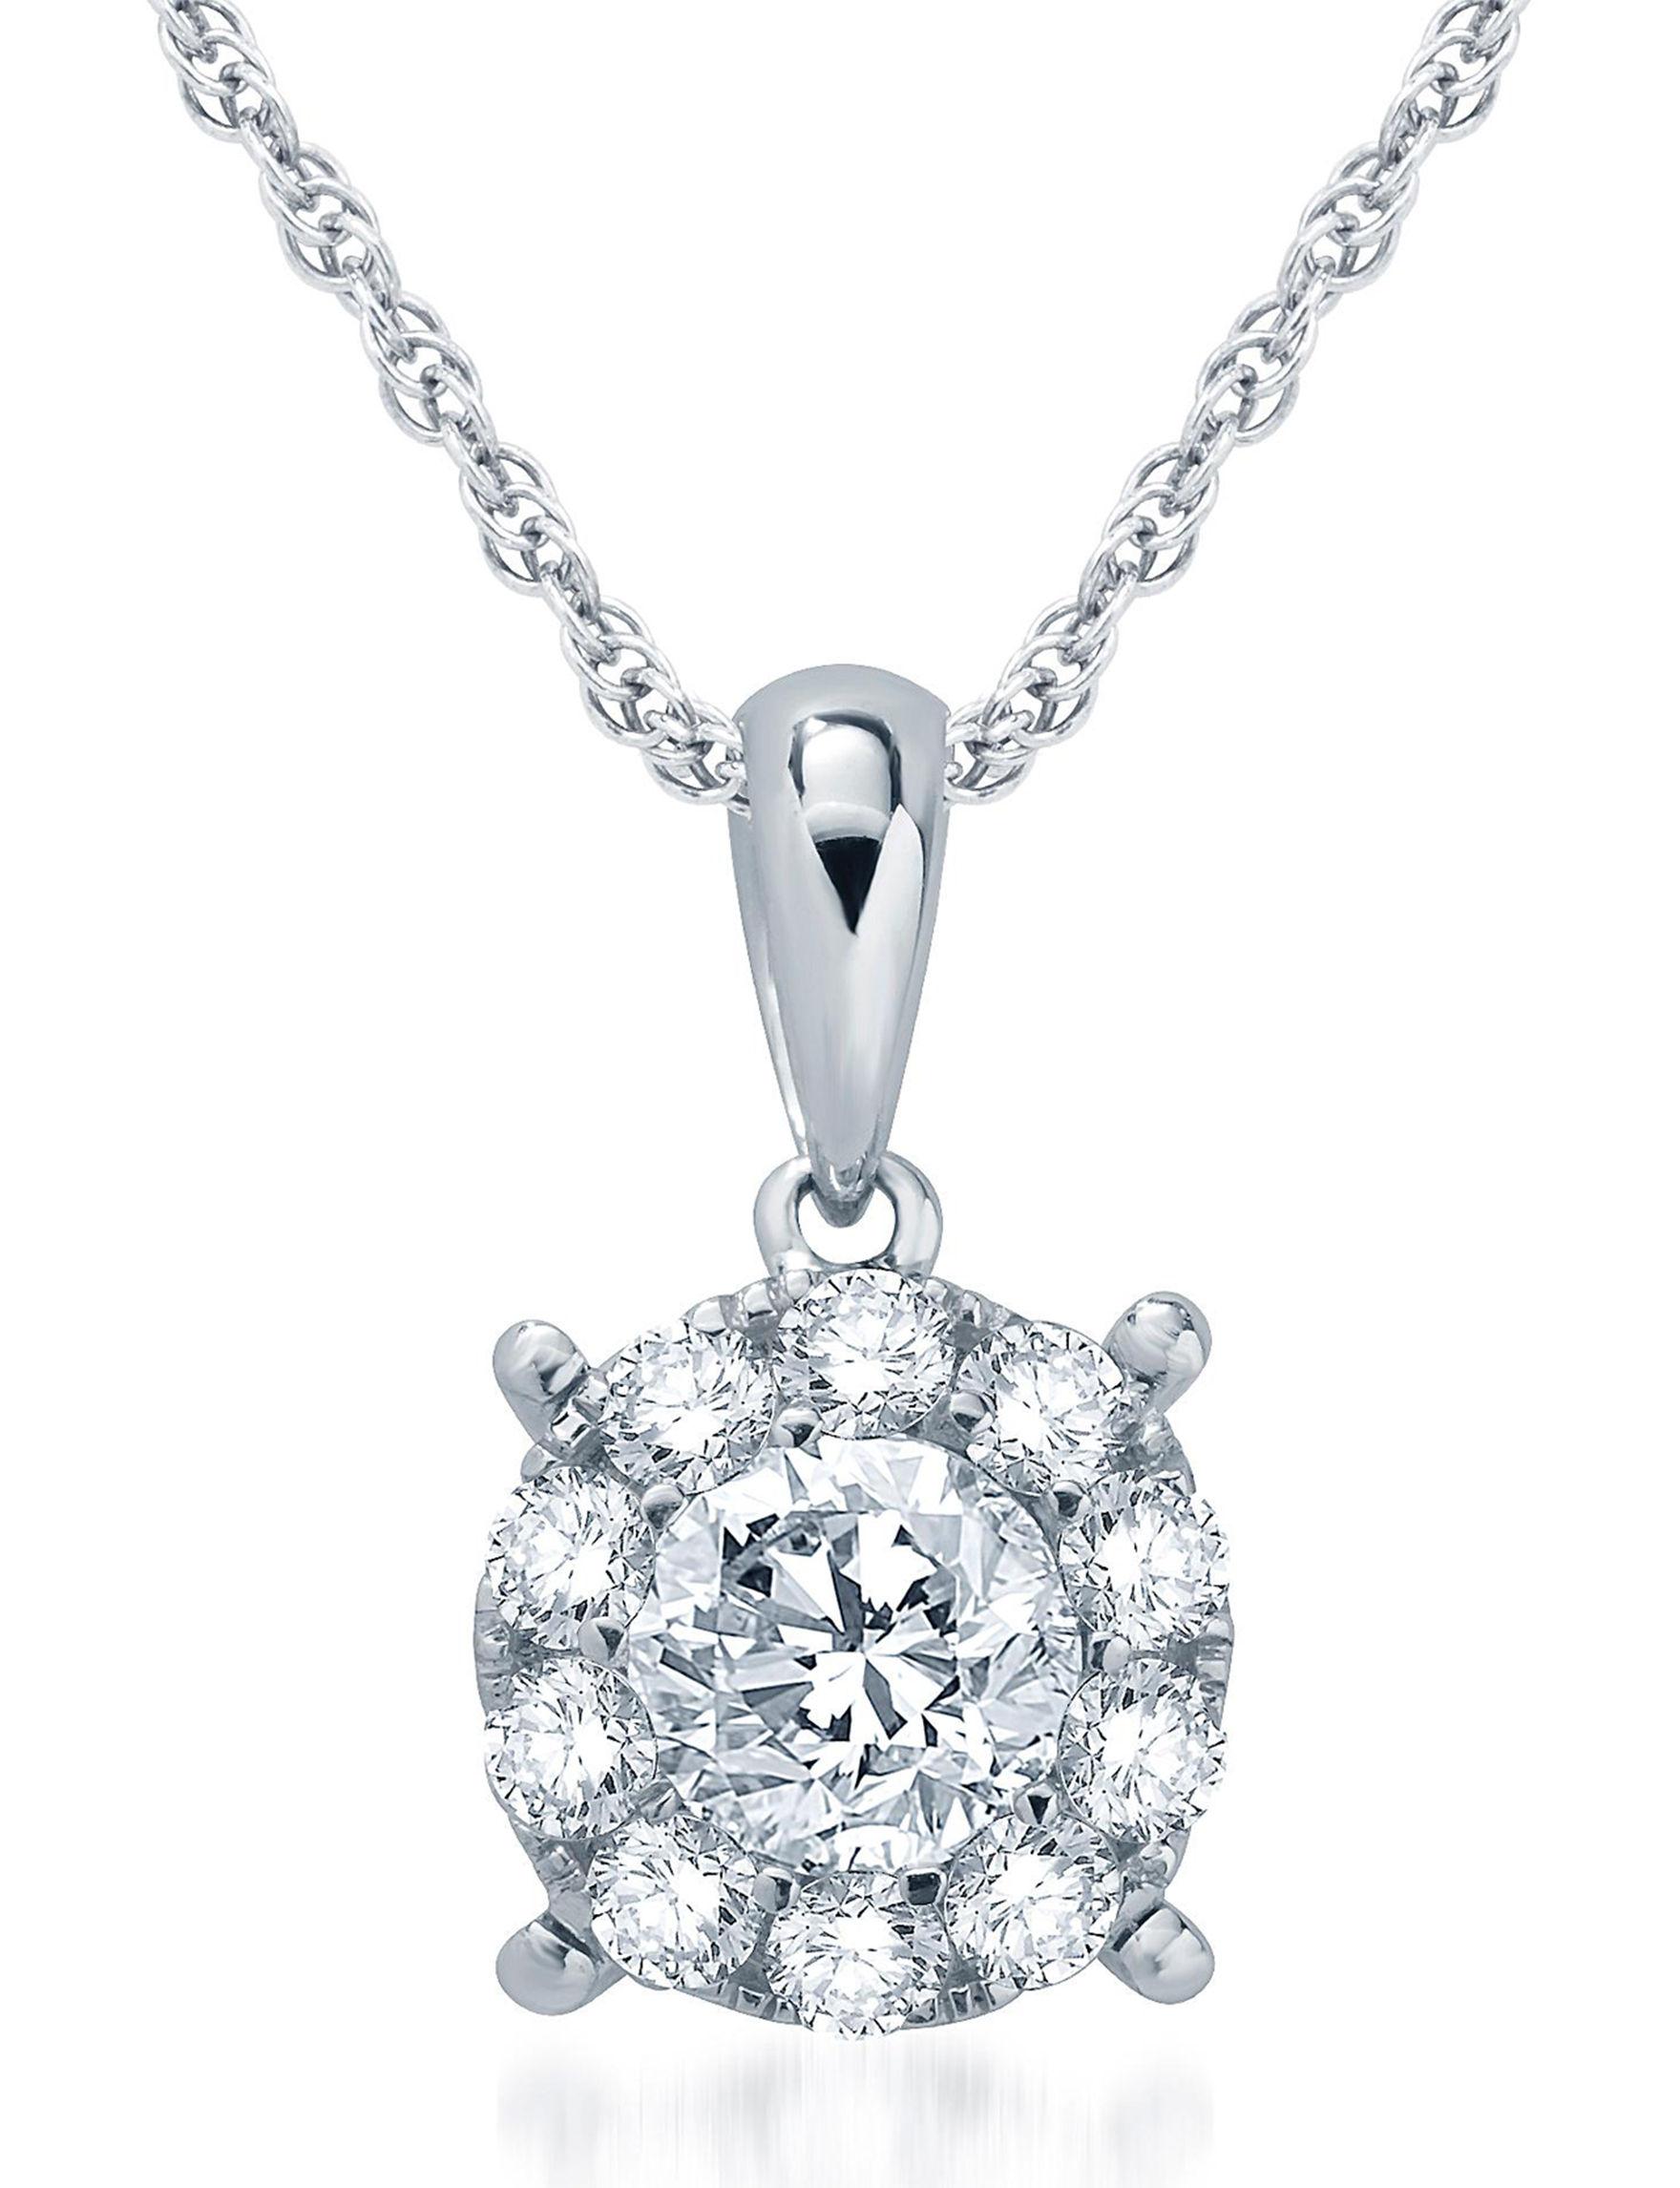 Kiran White Gold Necklaces & Pendants Fine Jewelry